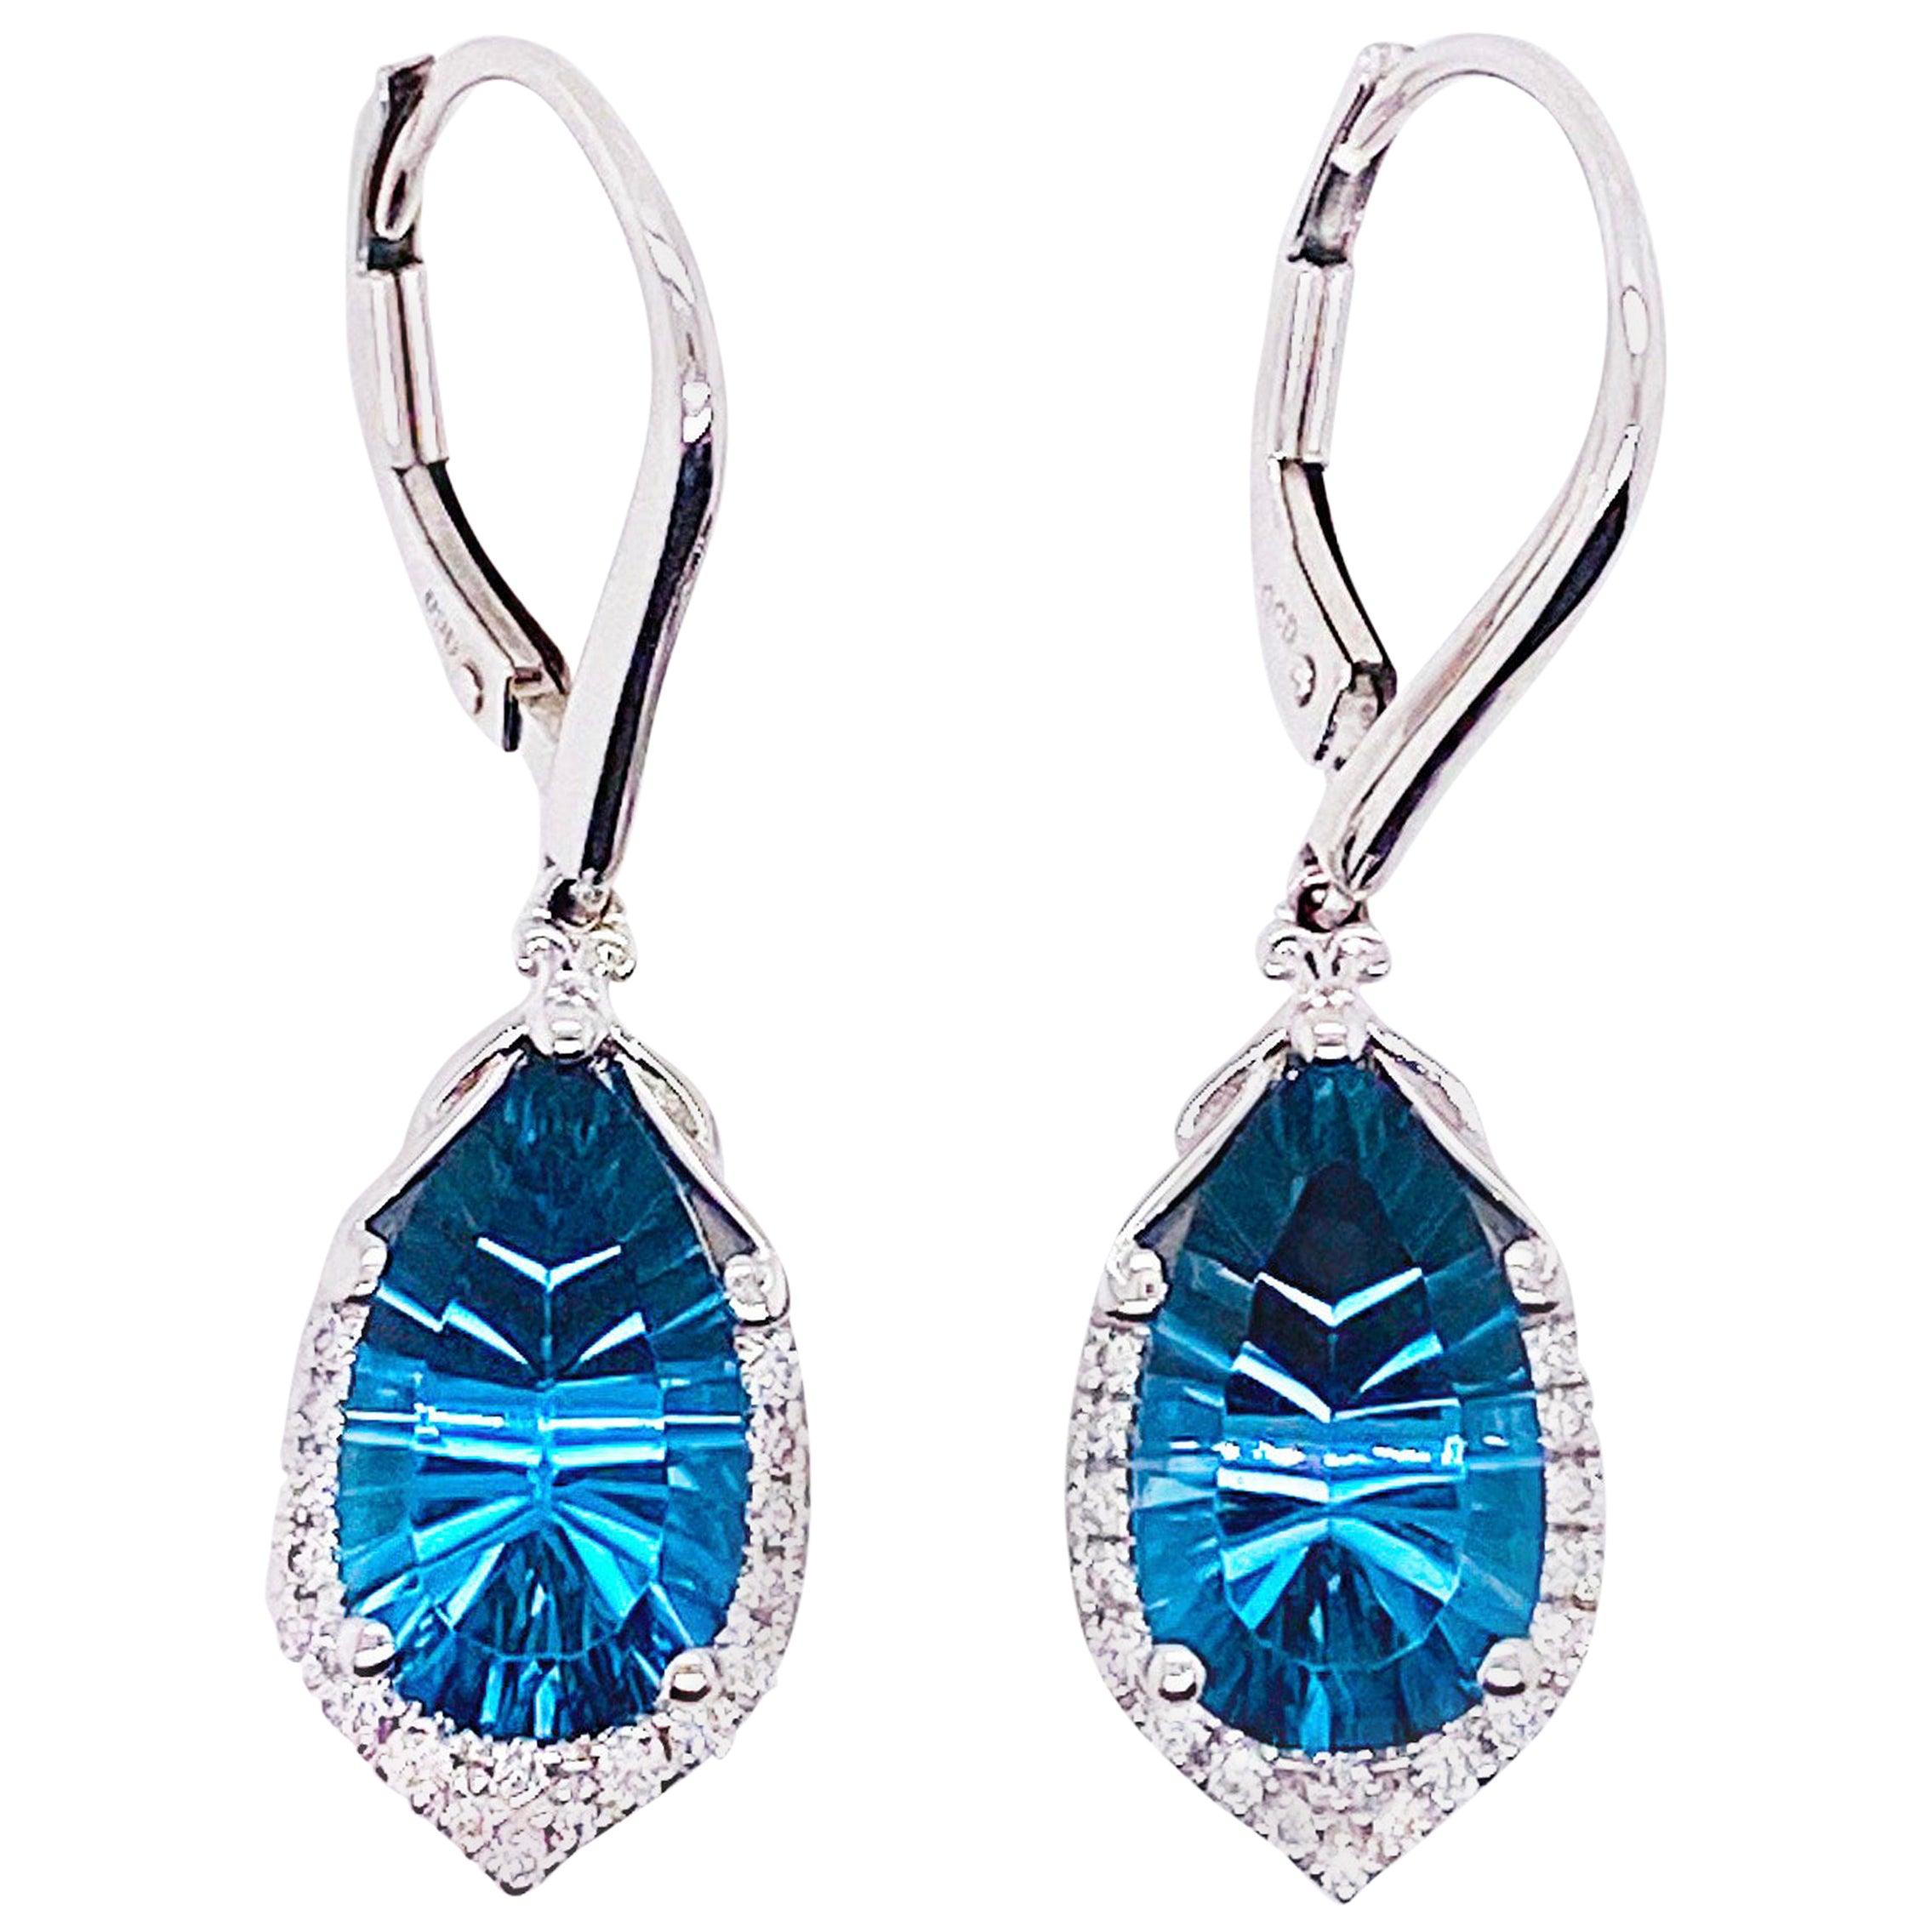 6 Carat London Blue Topaz & Diamond Earring Dangles 14 Karat Gold Topaz Earring